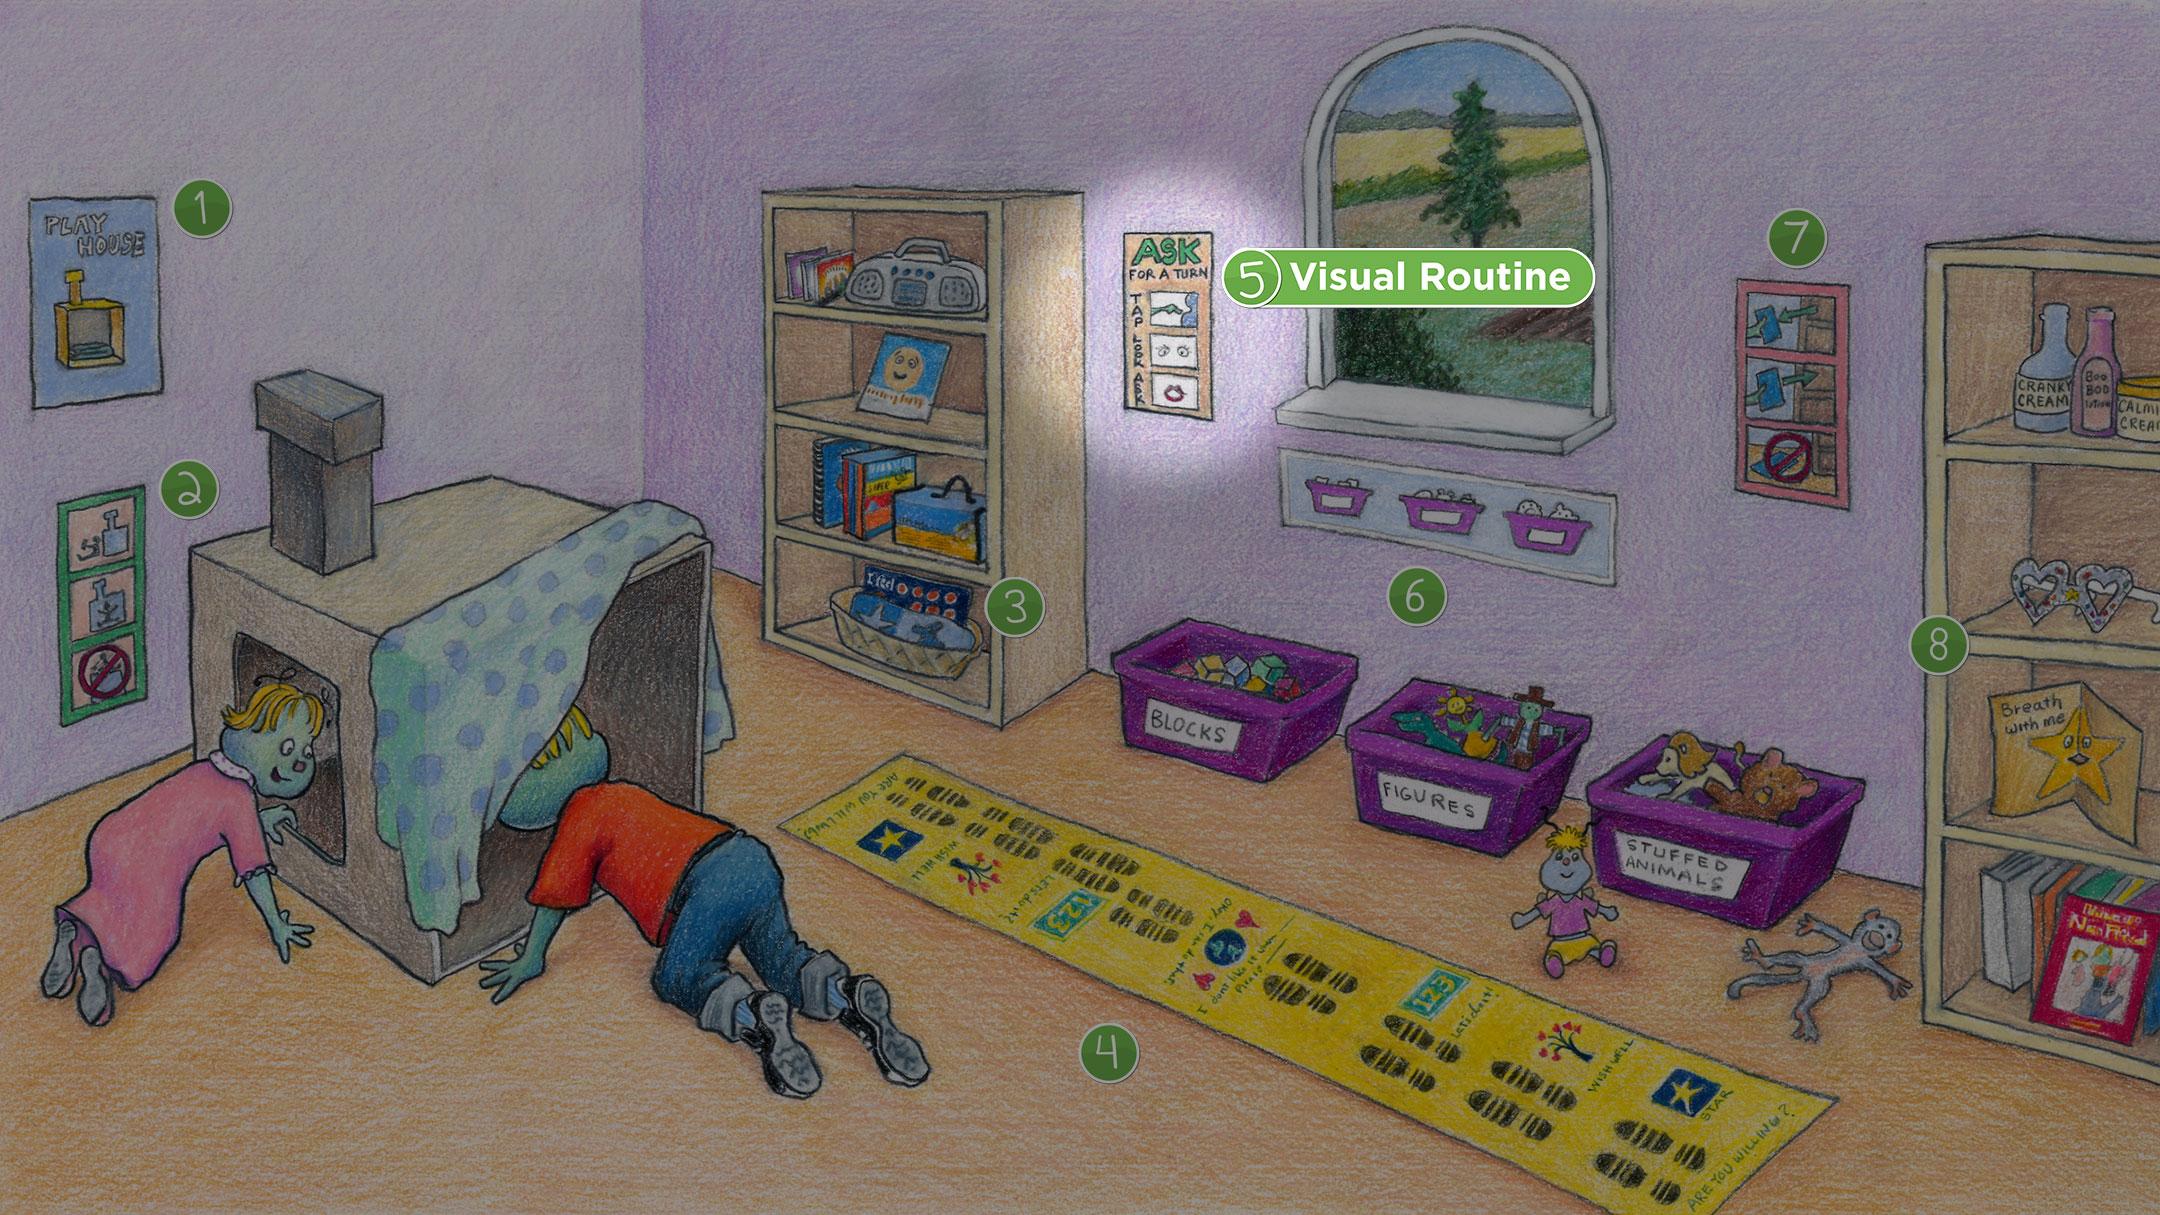 Playroom: Visual Routine